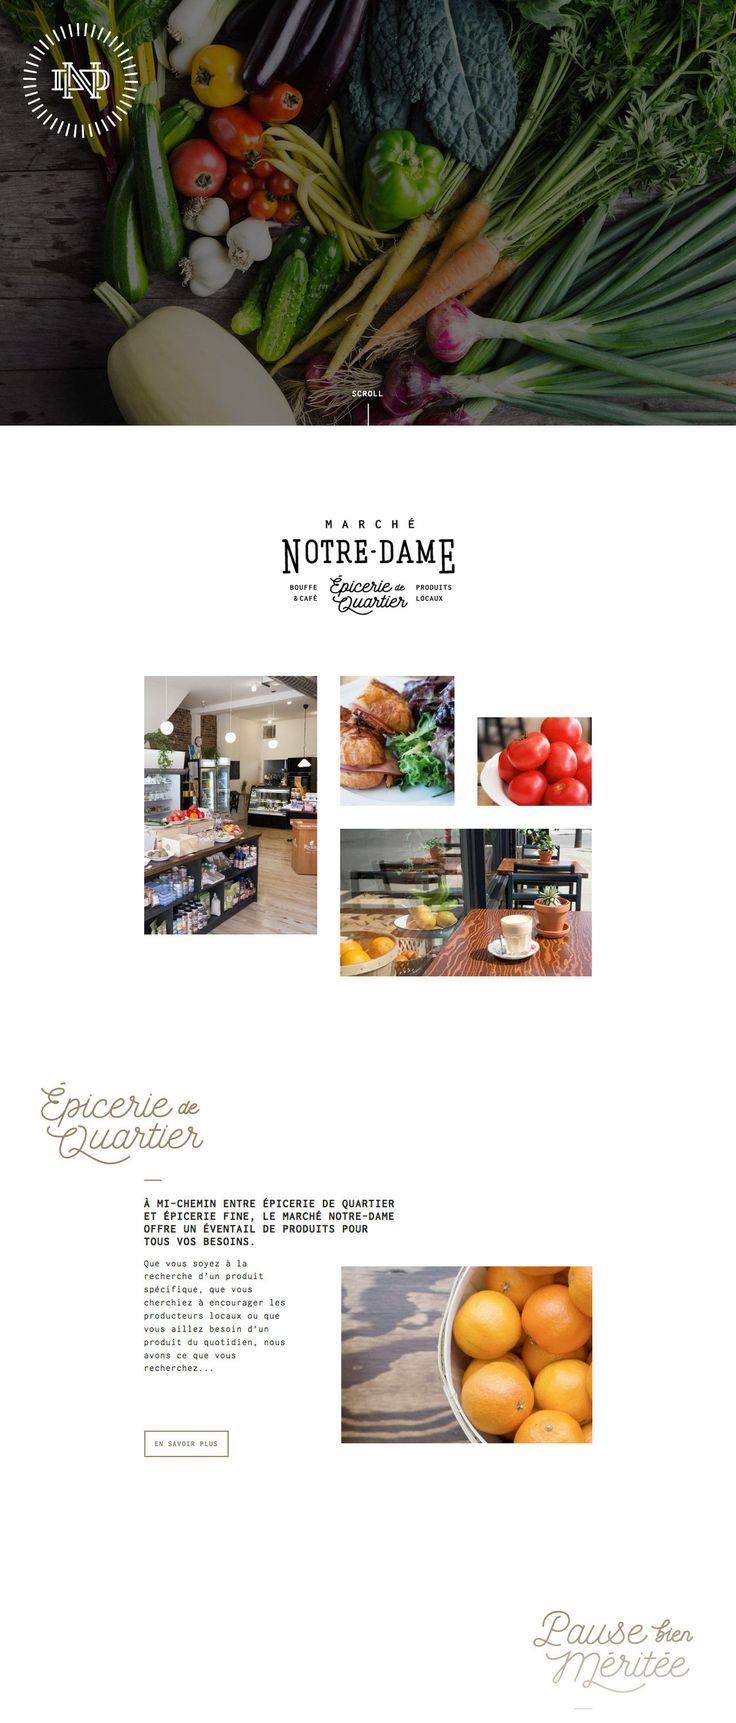 Marché Notre-Dame (More web design inspiration at topdesigninspiration.com) #design #web #webdesign #sitedesign #responsive #ux #ui